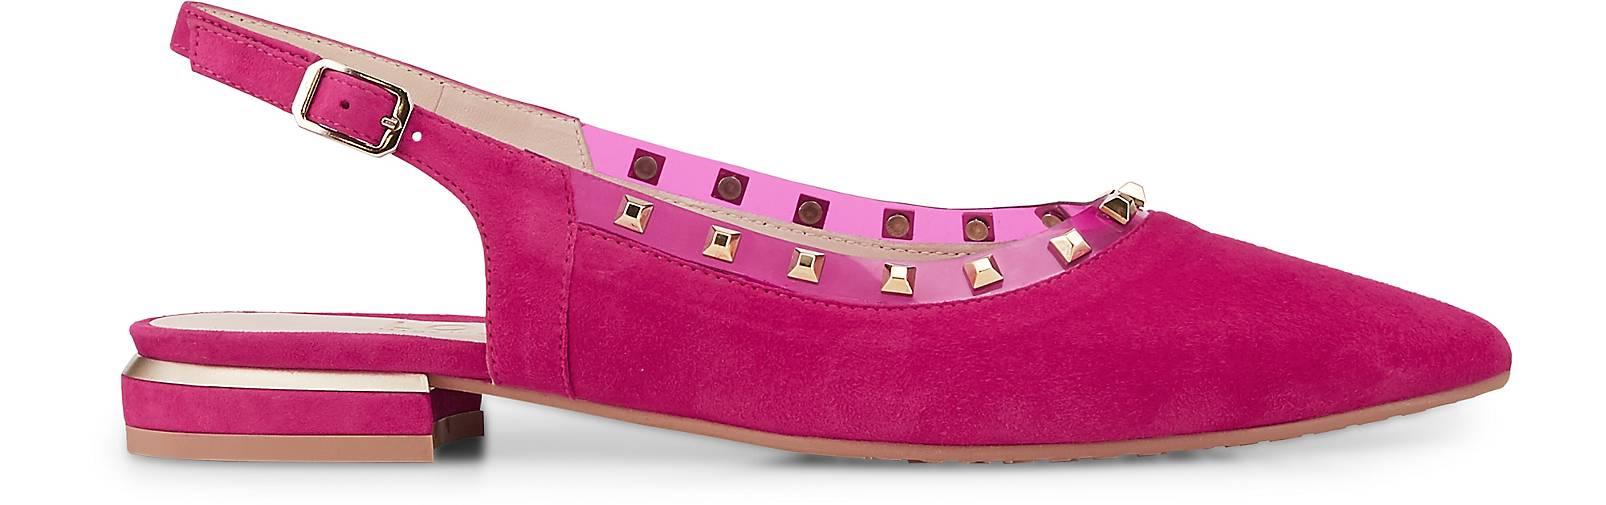 Lodi Sling-Ballerina BADIA in in in Rosa kaufen - 48427301 GÖRTZ Gute Qualität beliebte Schuhe e512cf